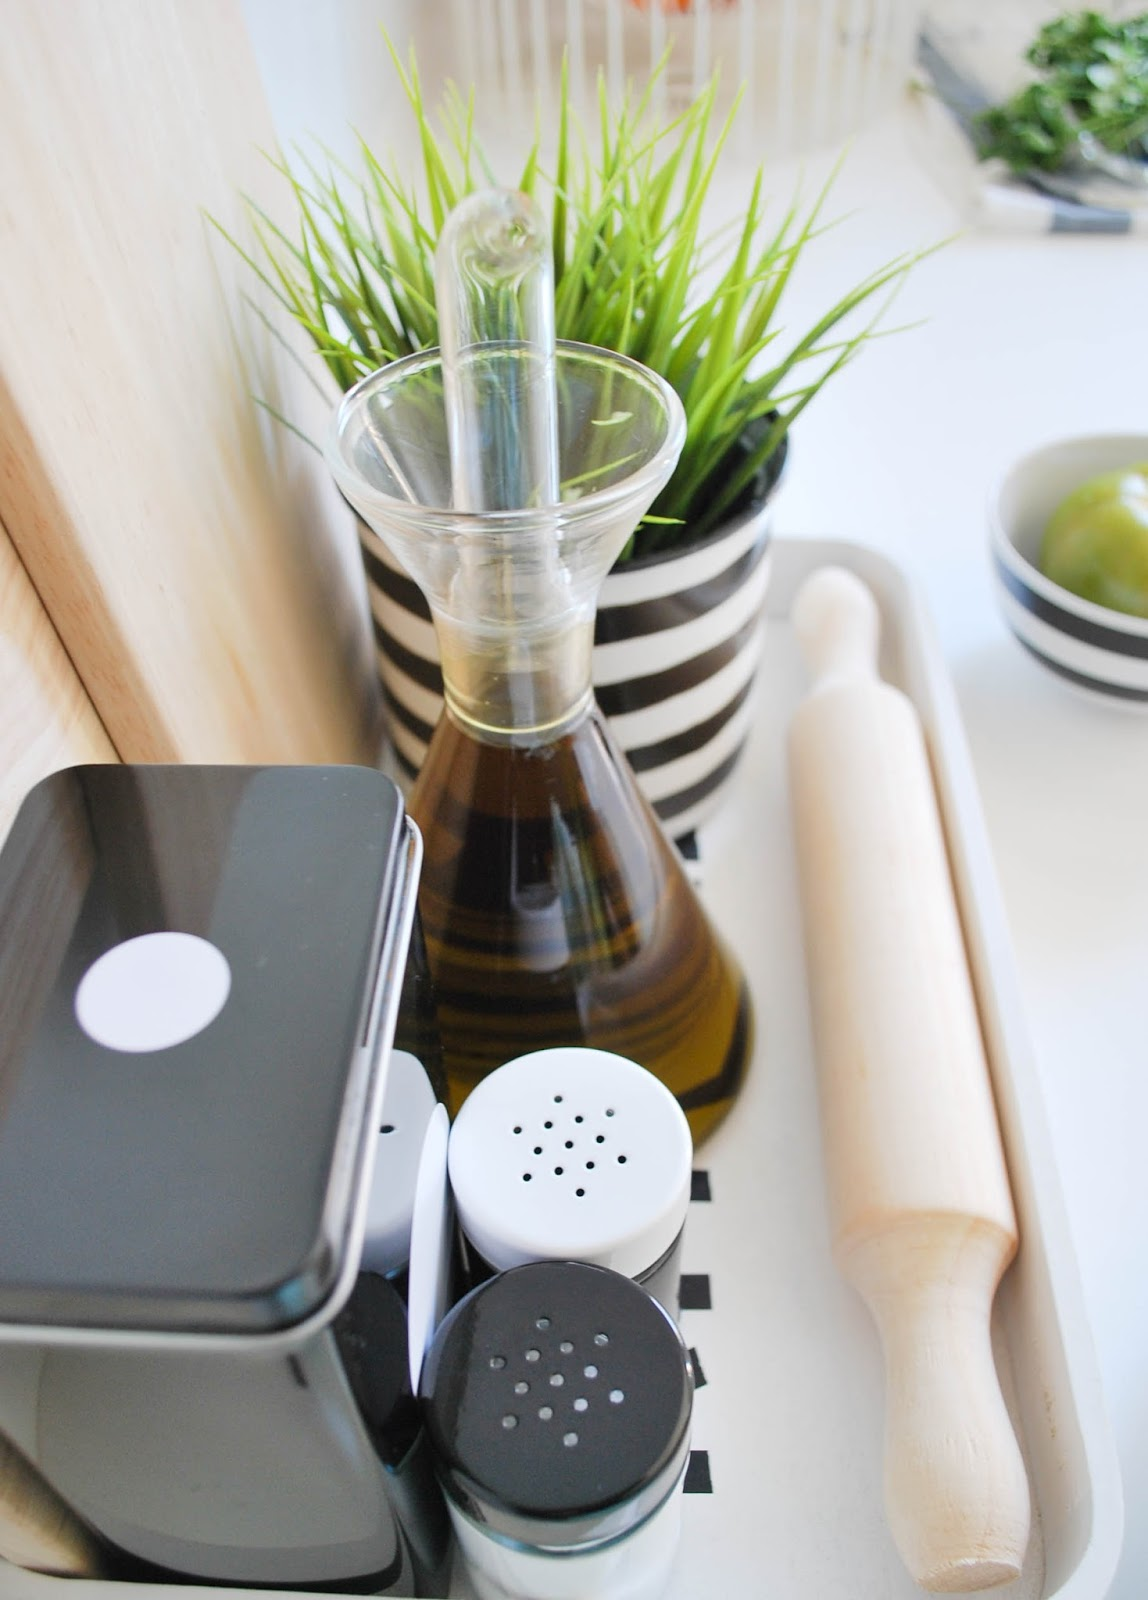 my home: un rincón de mi cocina V por www.mylittlebrunch.com